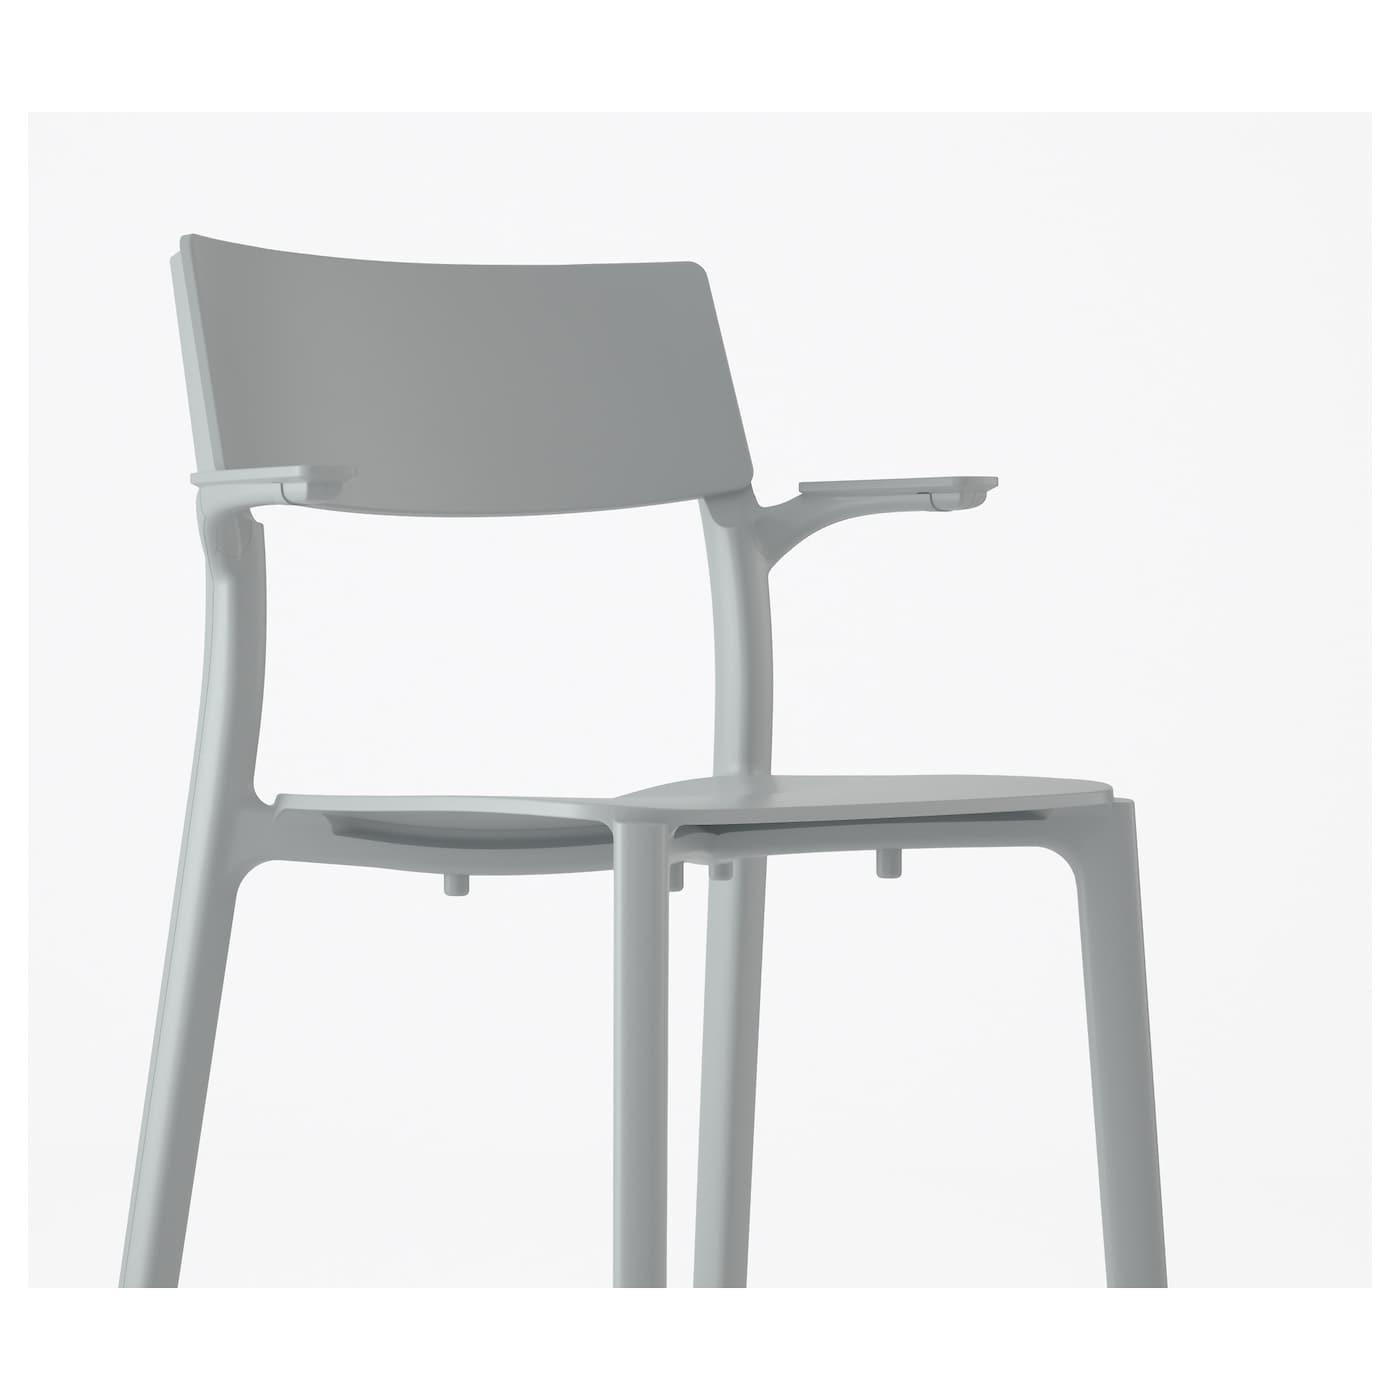 janinge chaise accoudoirs gris ikea. Black Bedroom Furniture Sets. Home Design Ideas